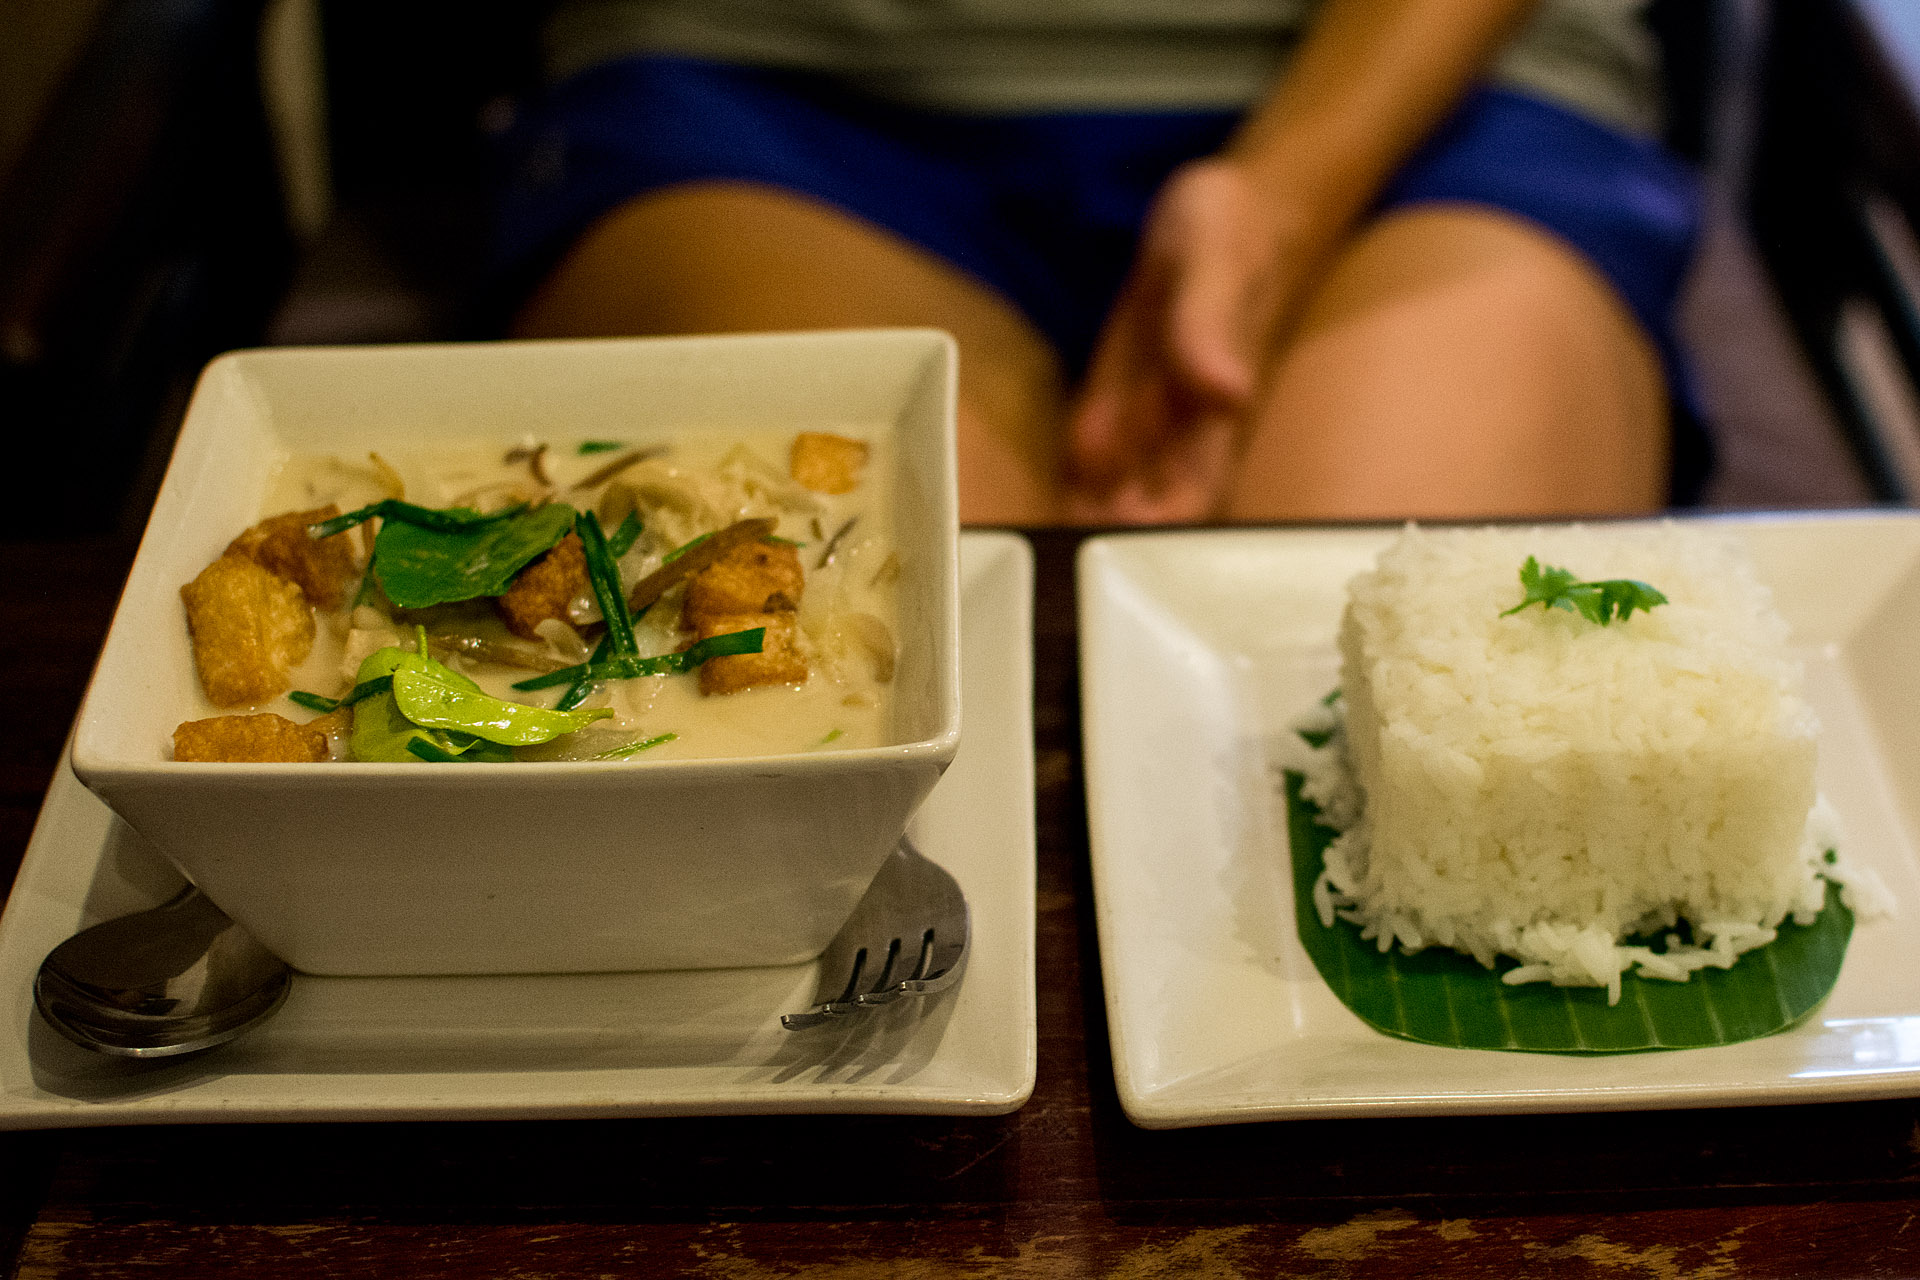 Khoa Khing Taohu (coconut milk, ginger, onion & herbs) (Indigo Cafe)